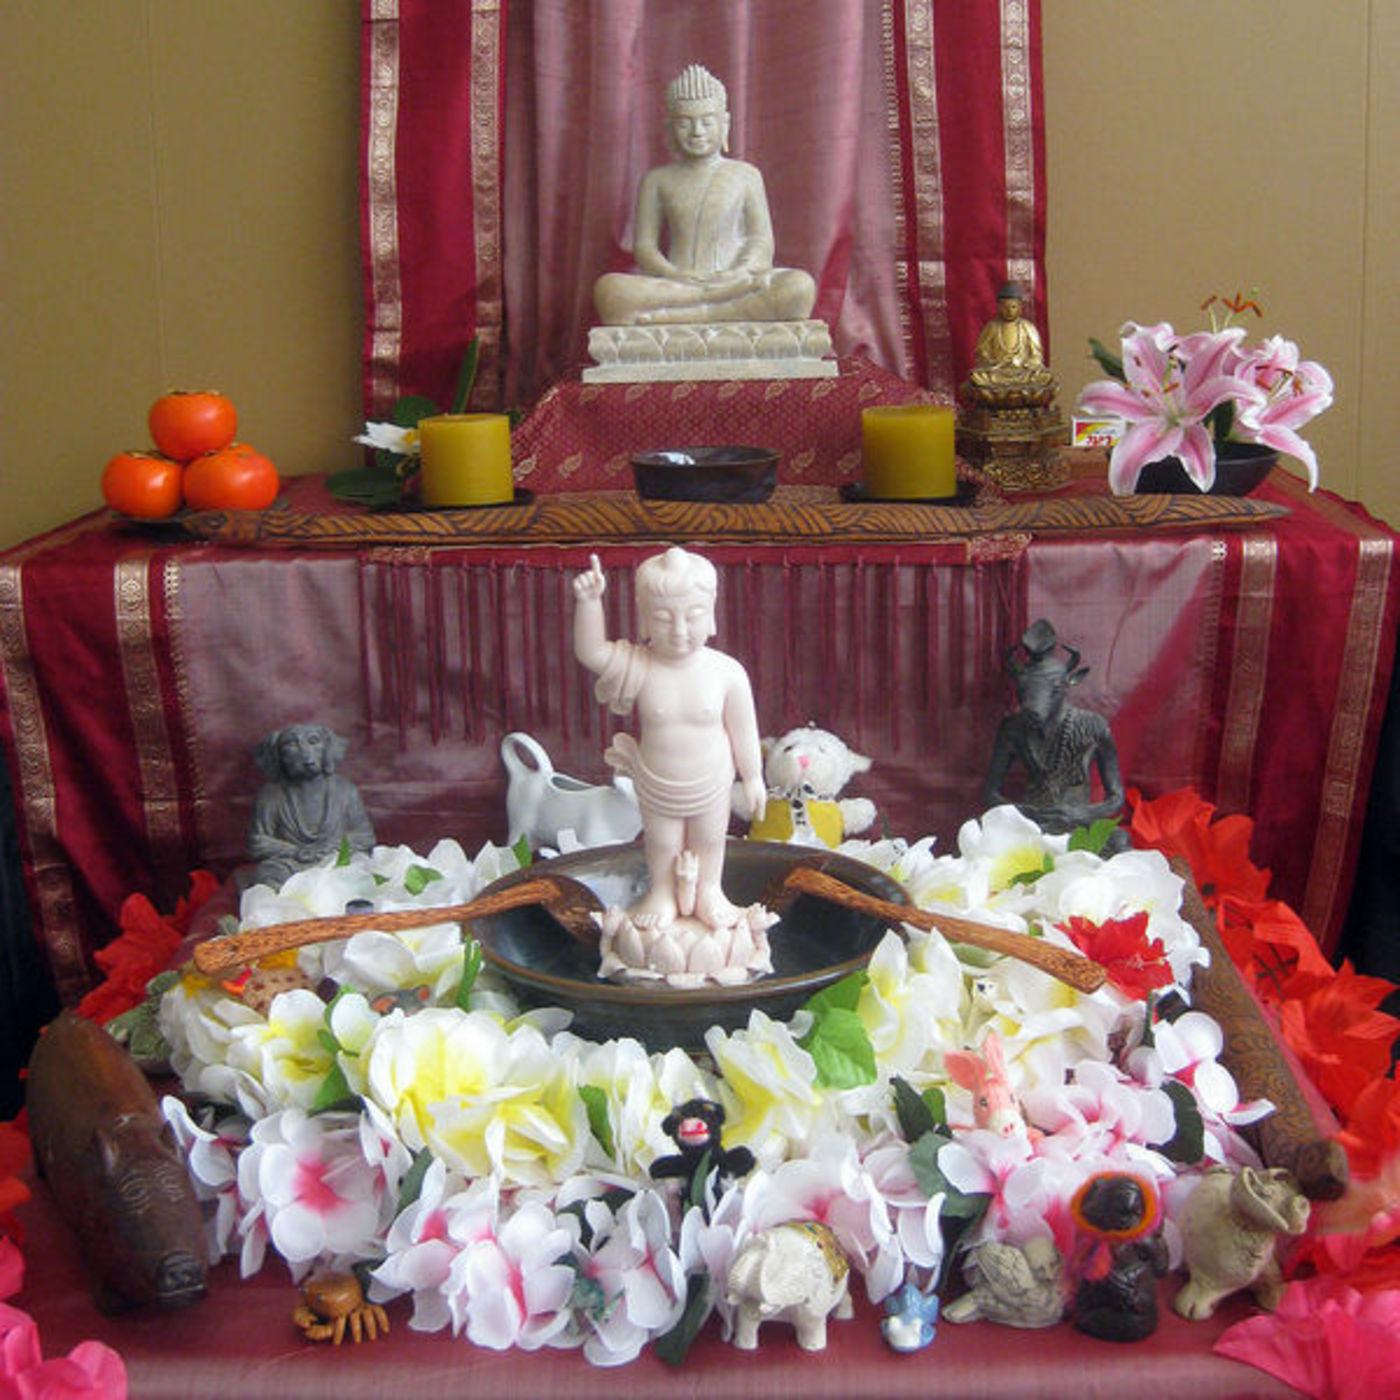 <![CDATA[Auckland Zen Centre: Suggestions for Beginners]]>